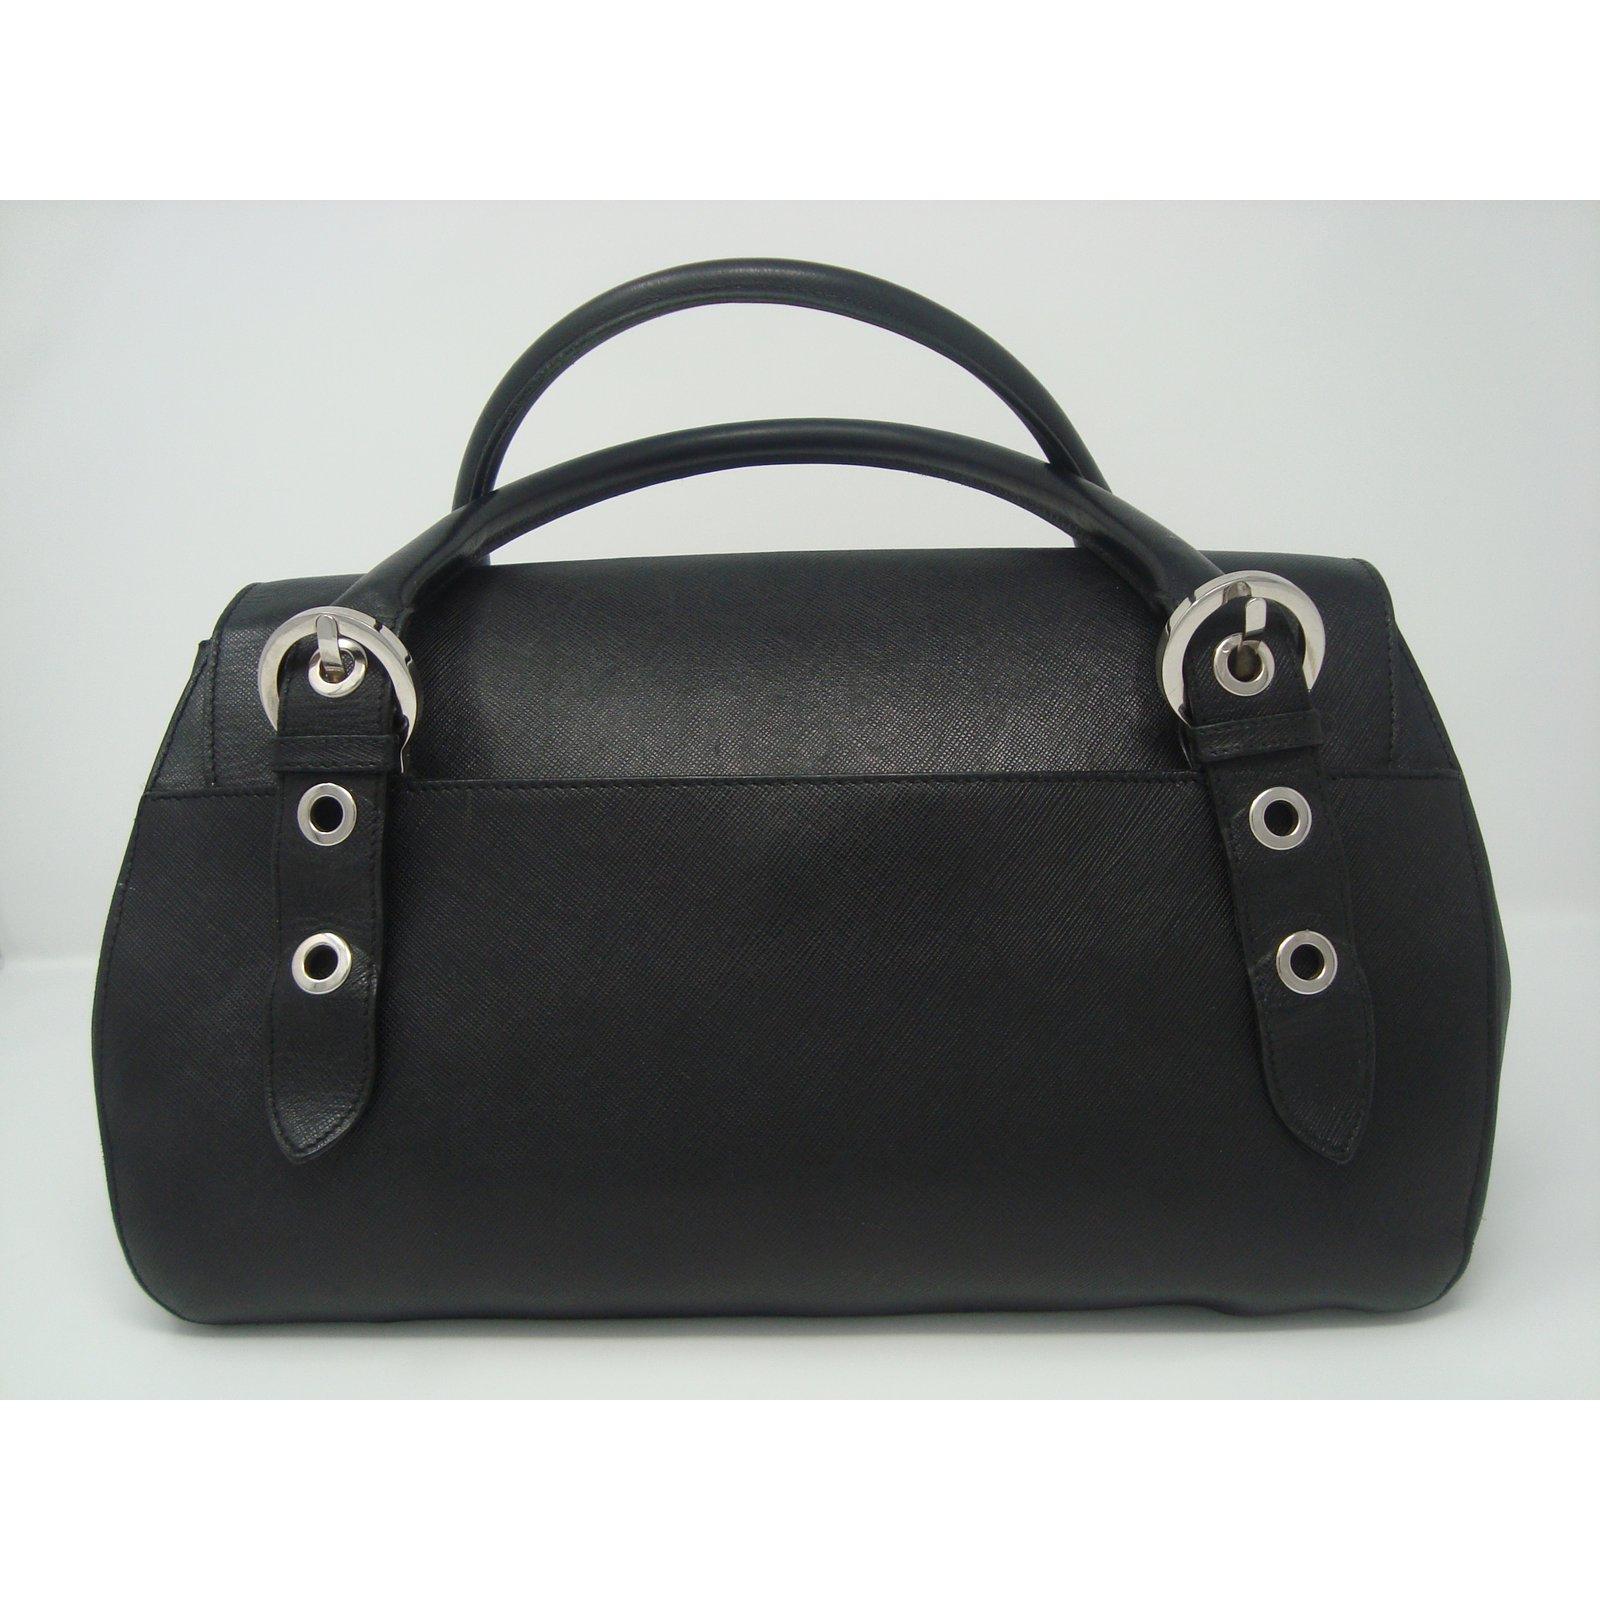 435aab858 Salvatore Ferragamo Handbags Handbags Leather Black ref.77065 - Joli ...